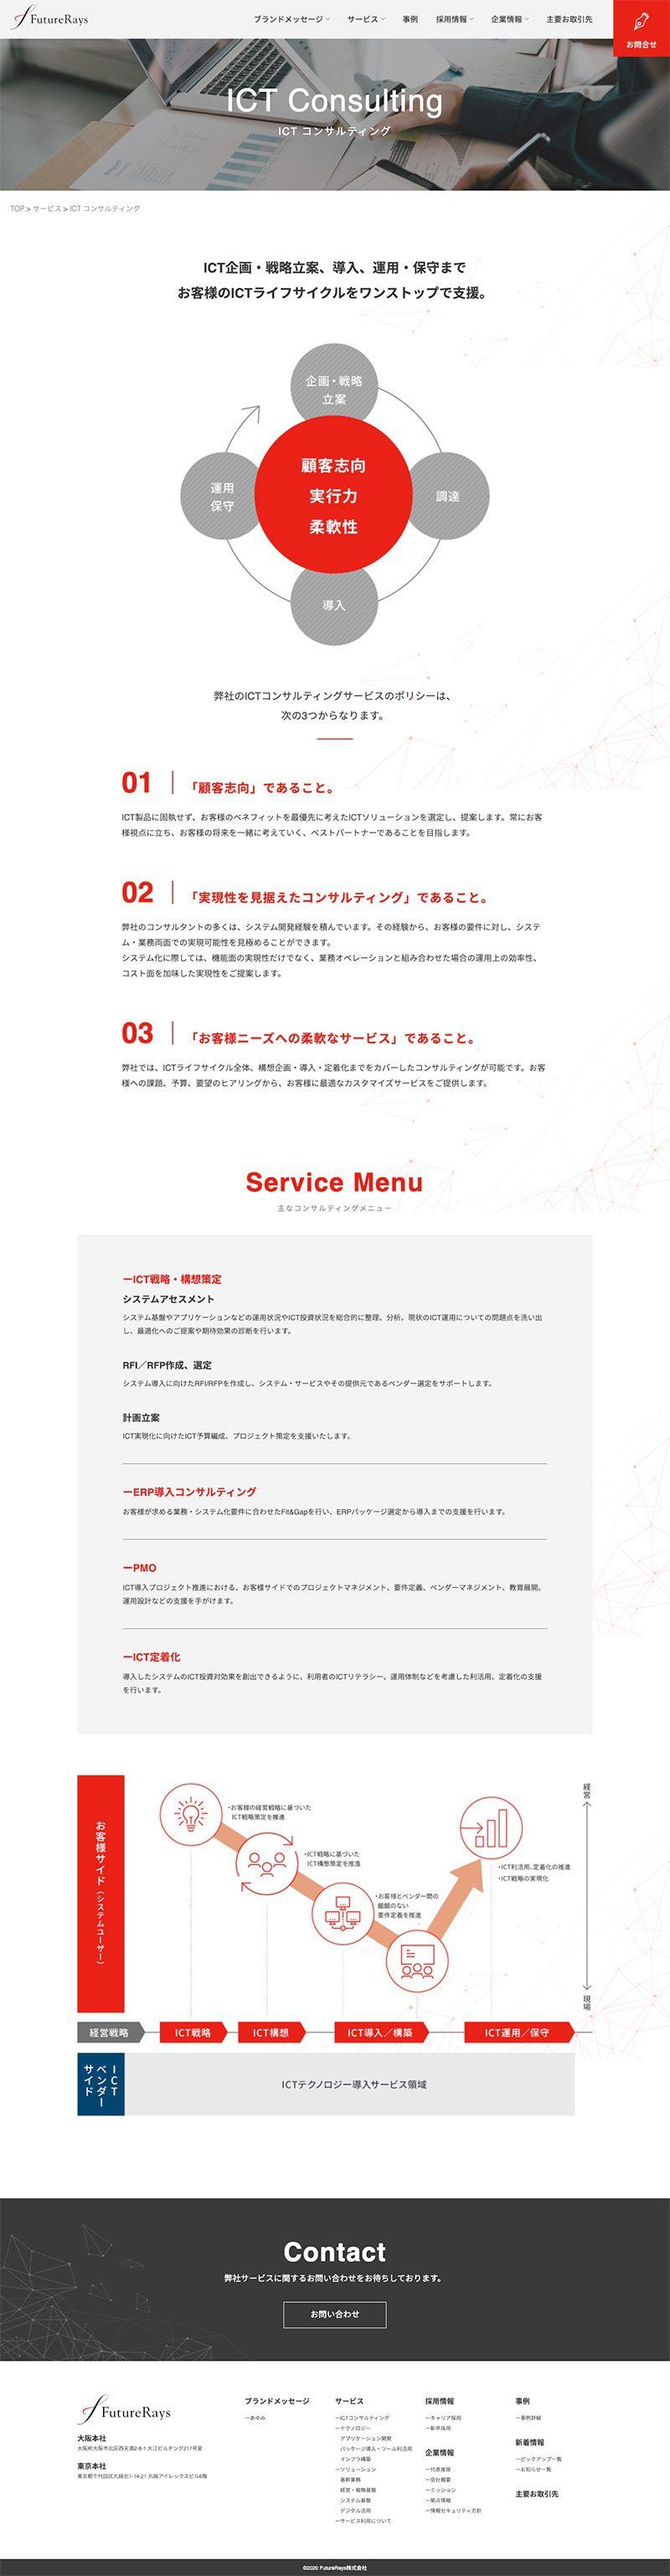 FutureRays株式会社様|コーポレートサイト/サービスメニュー